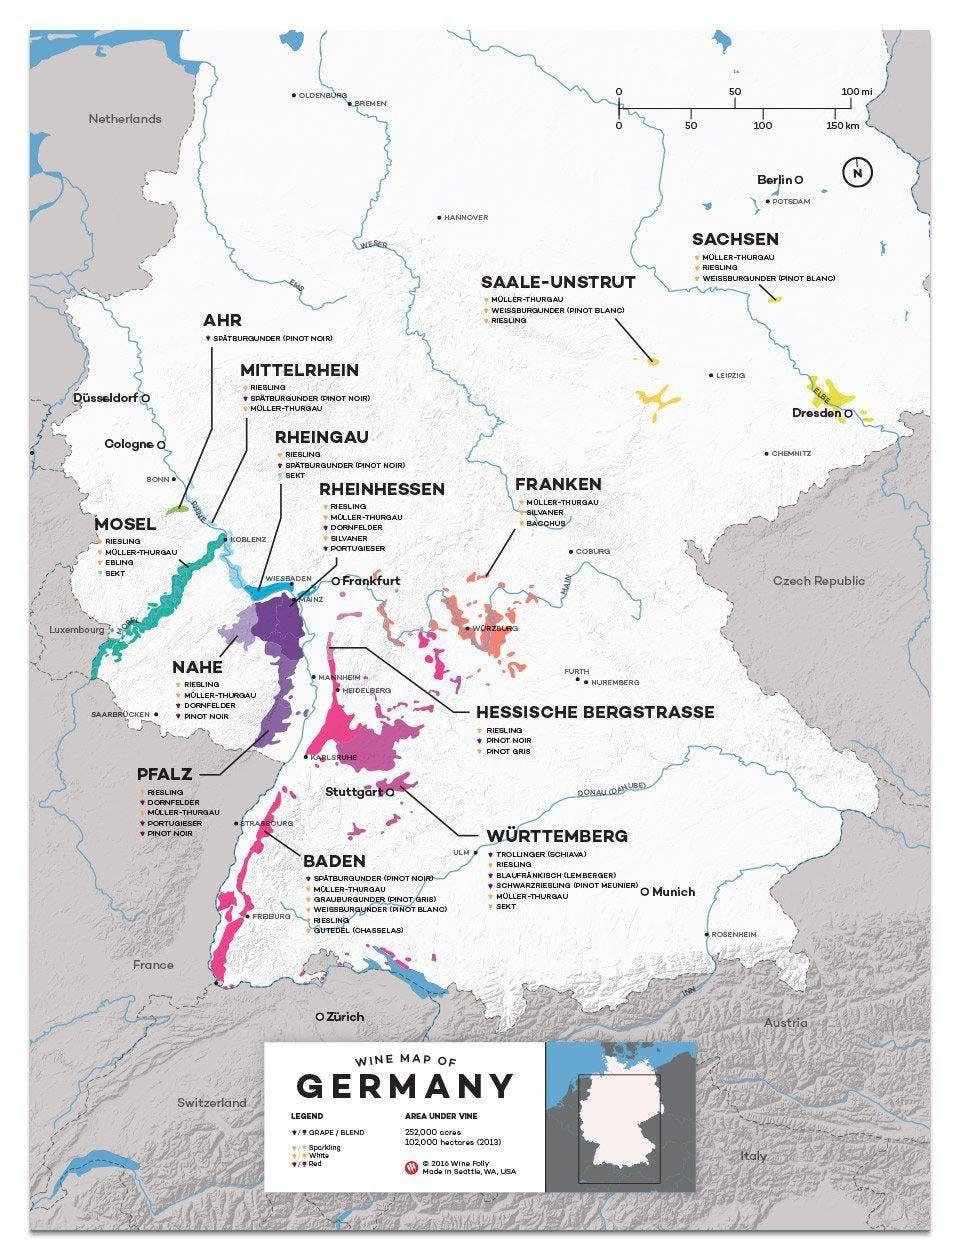 Wine Education Series: Germany